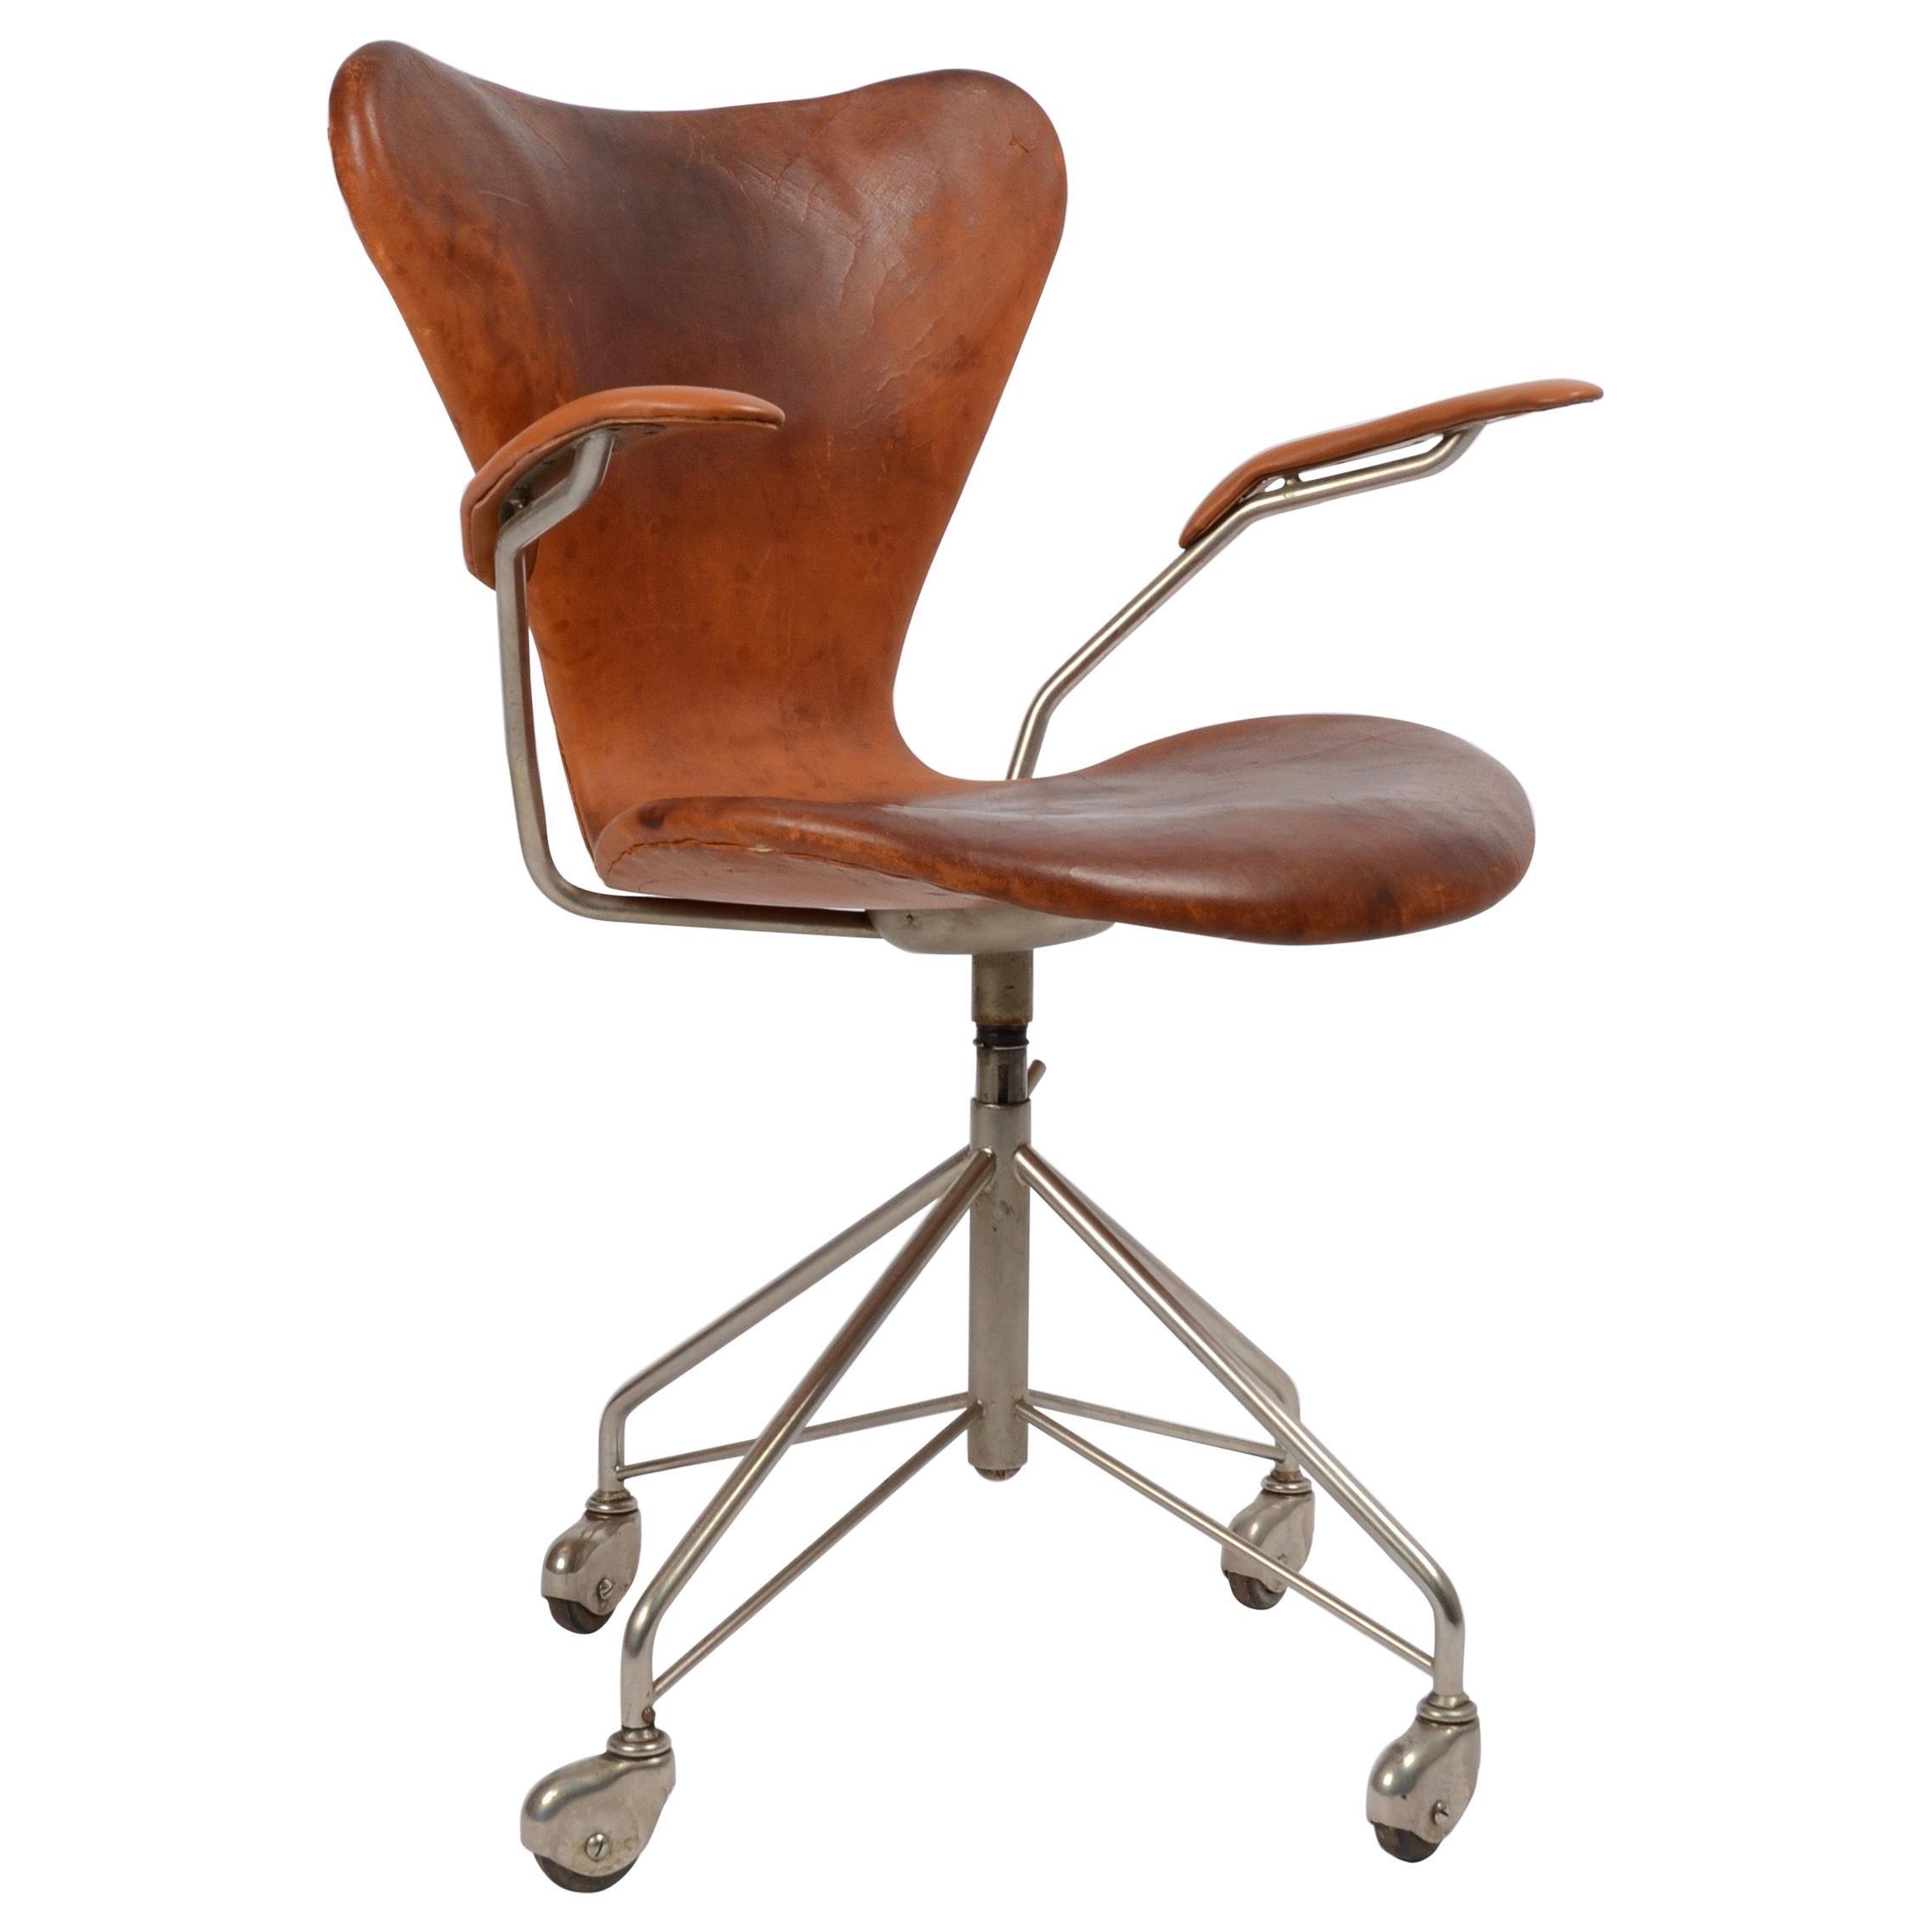 Arne Jacobsen, Office Chair, ´Sjuan/Seven´/ AJ 3217, Fritz Hansen, 1950s-1960s